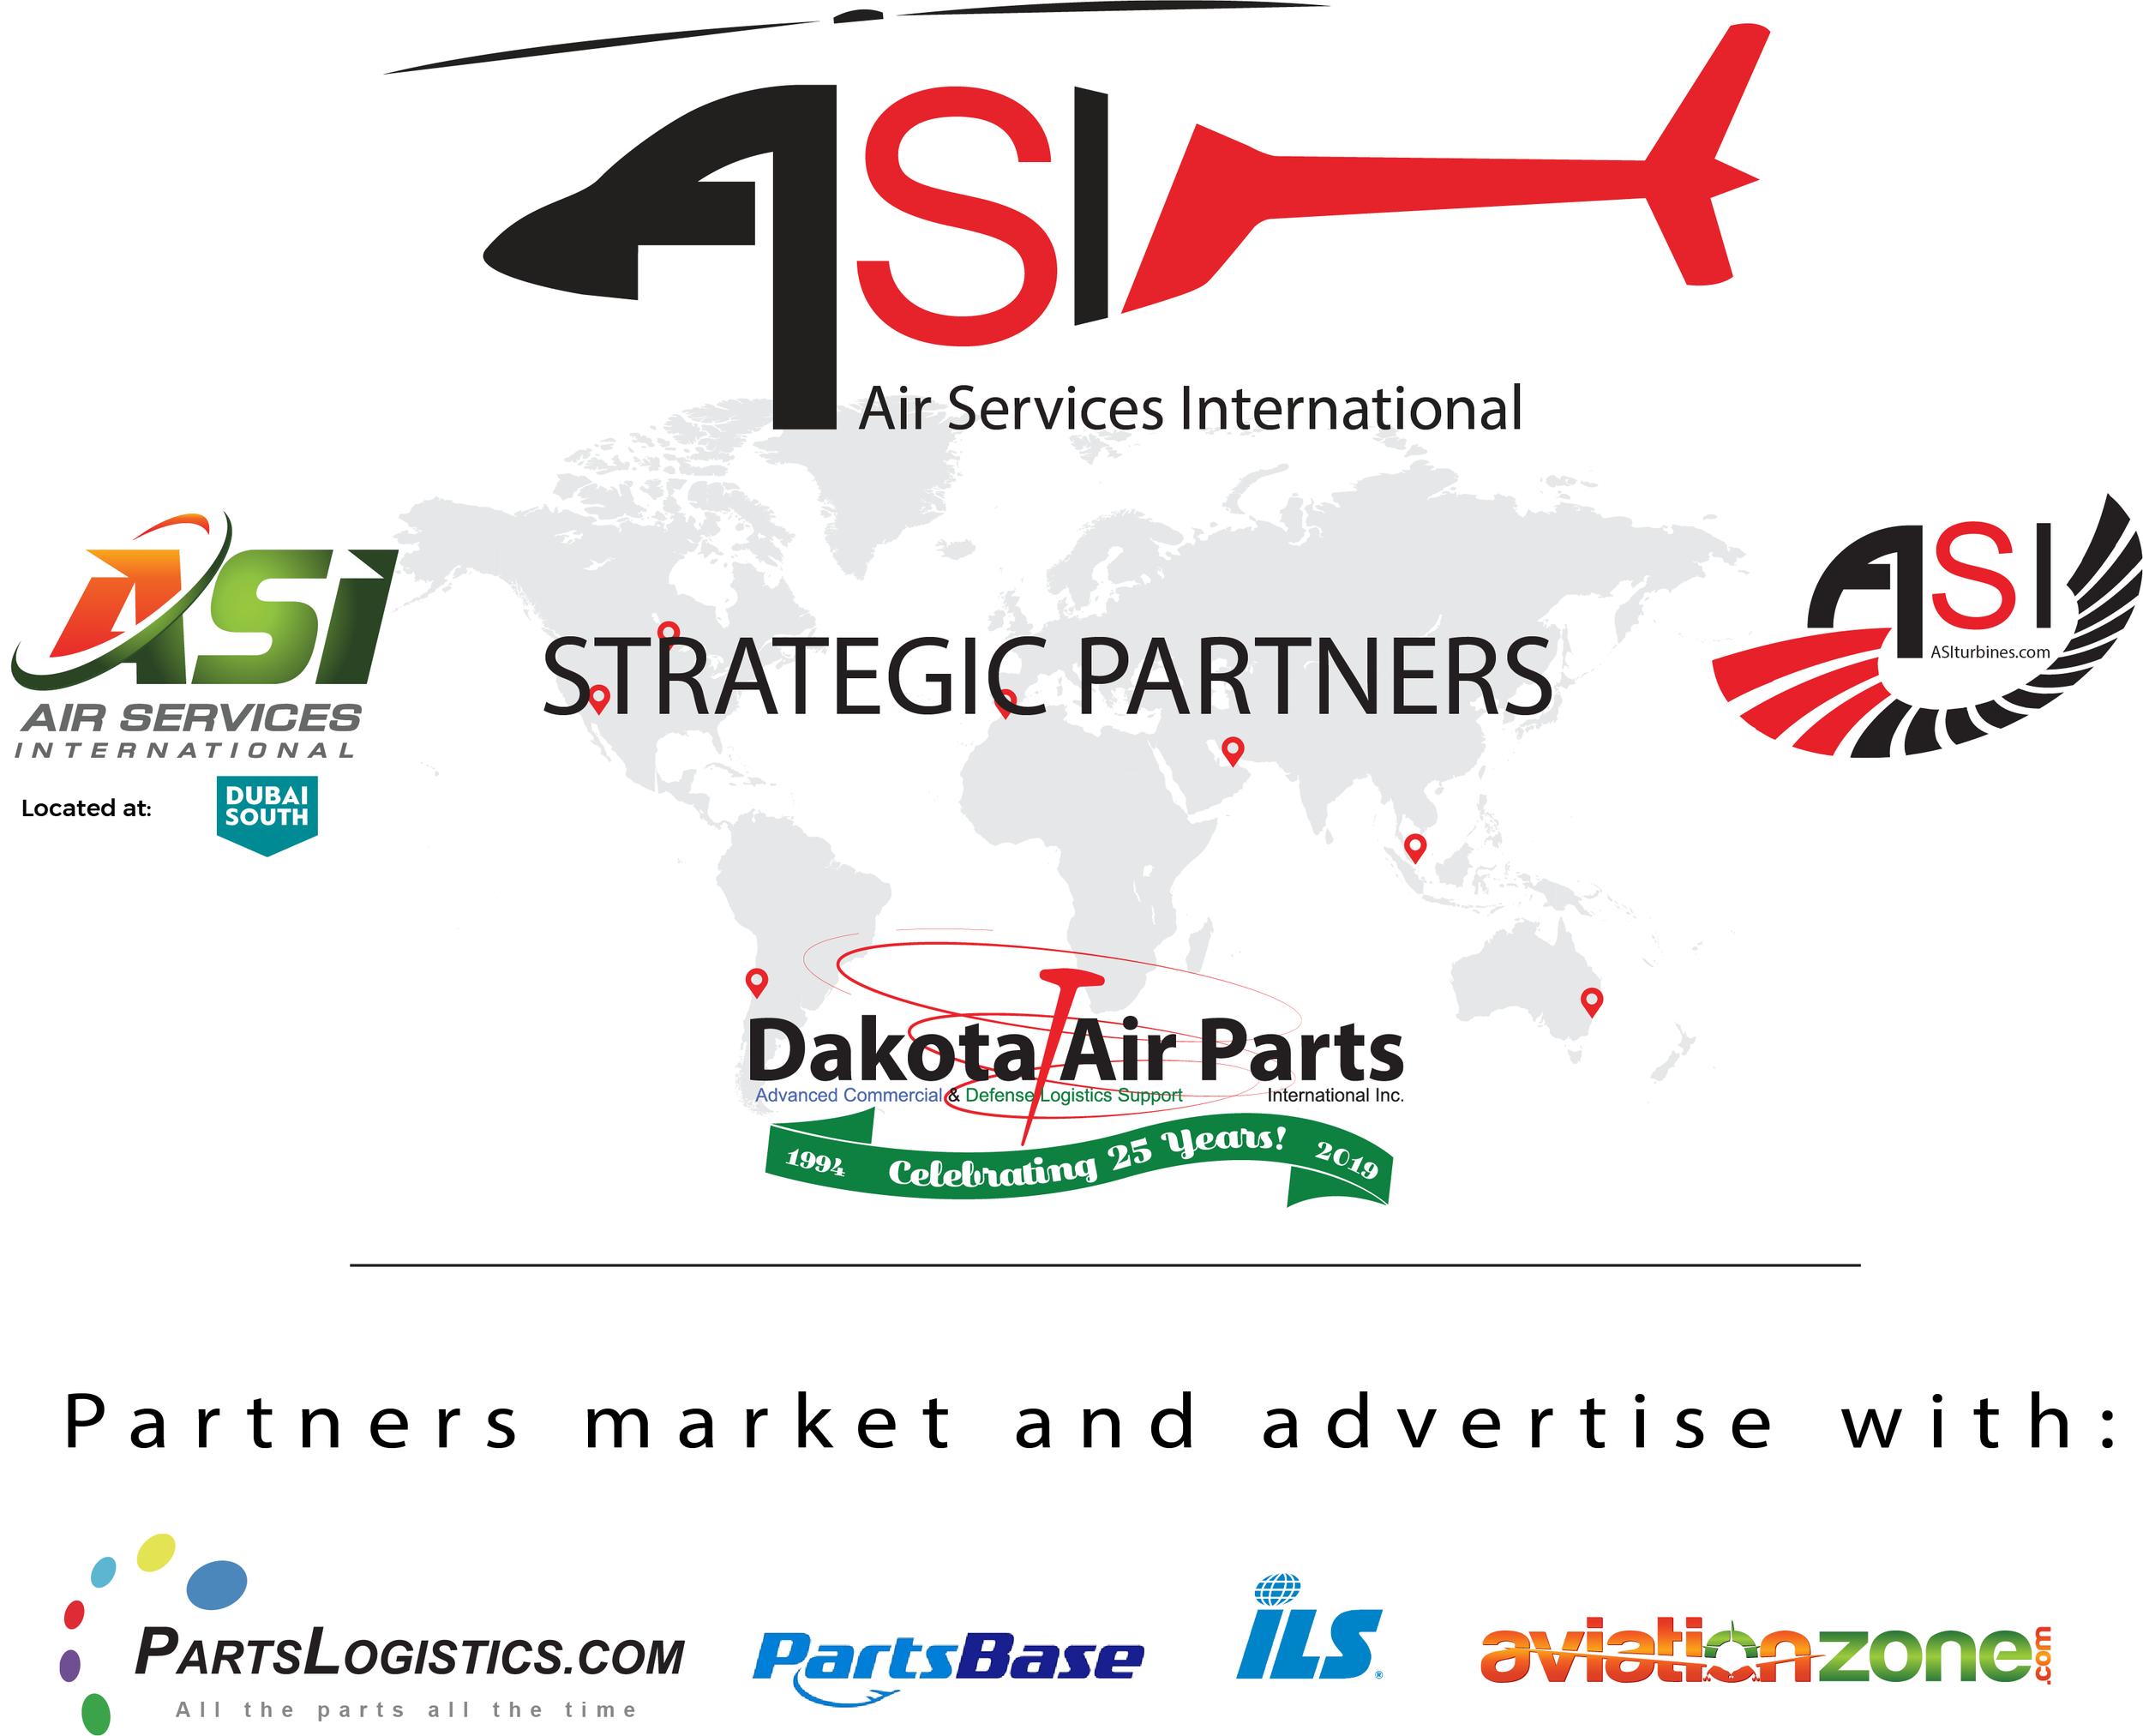 Dakota Air Parts - Air Service International